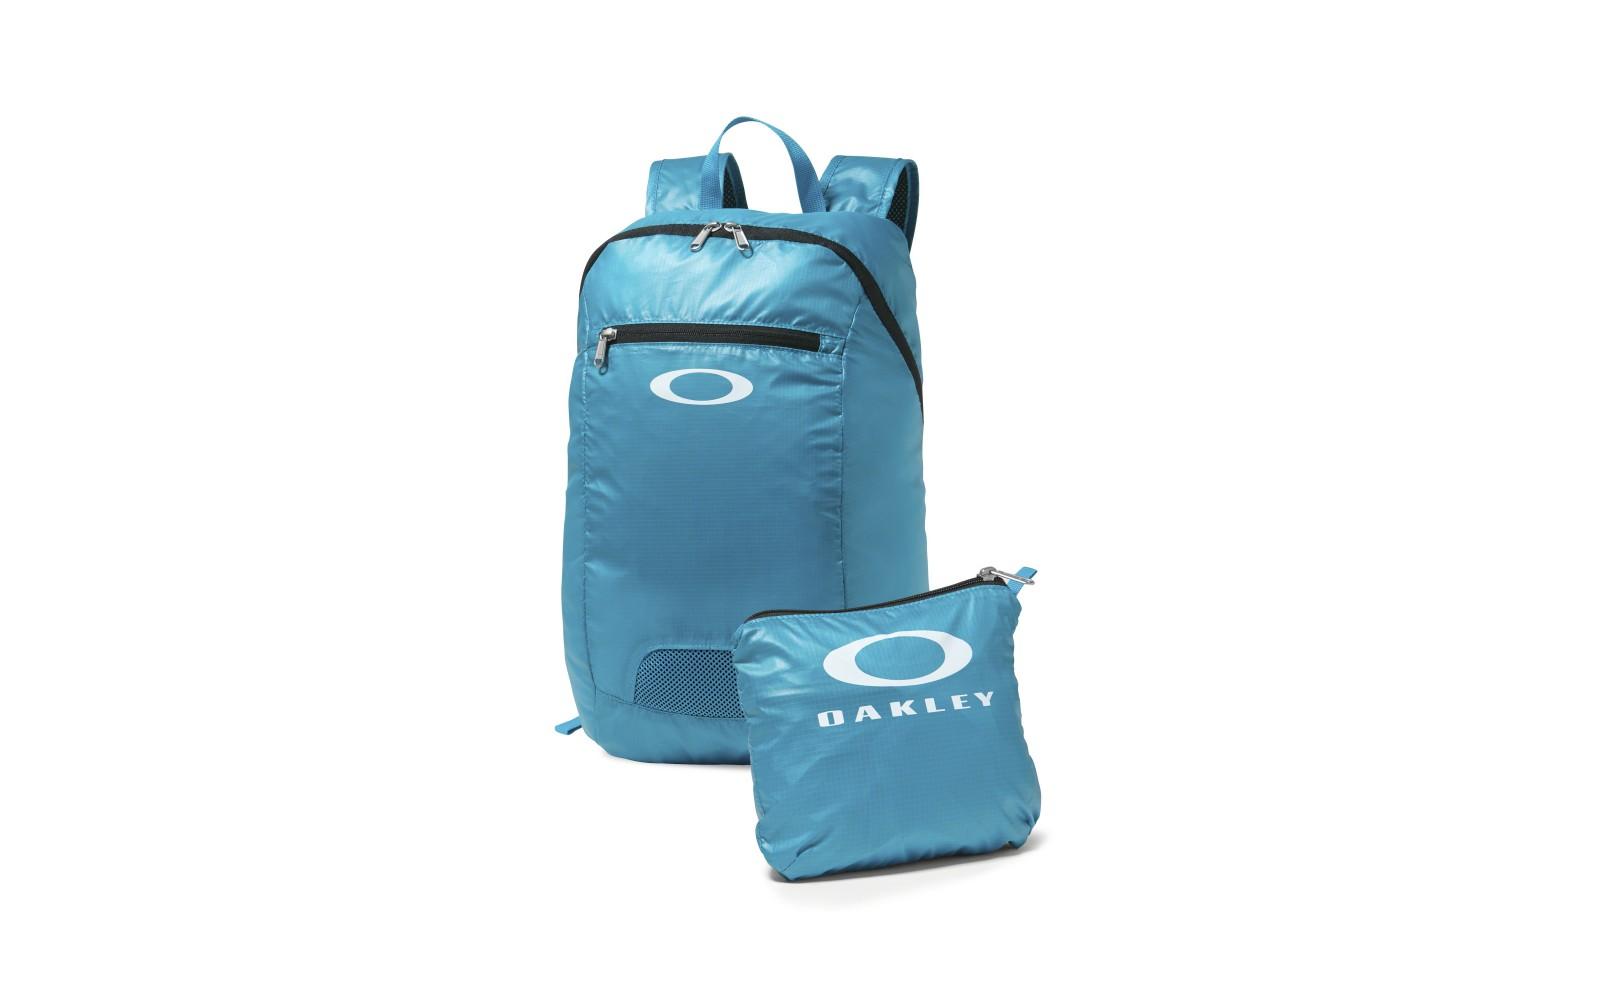 Oakley Packable Backpack - Lake Blue - 92732-6AD Rugzak